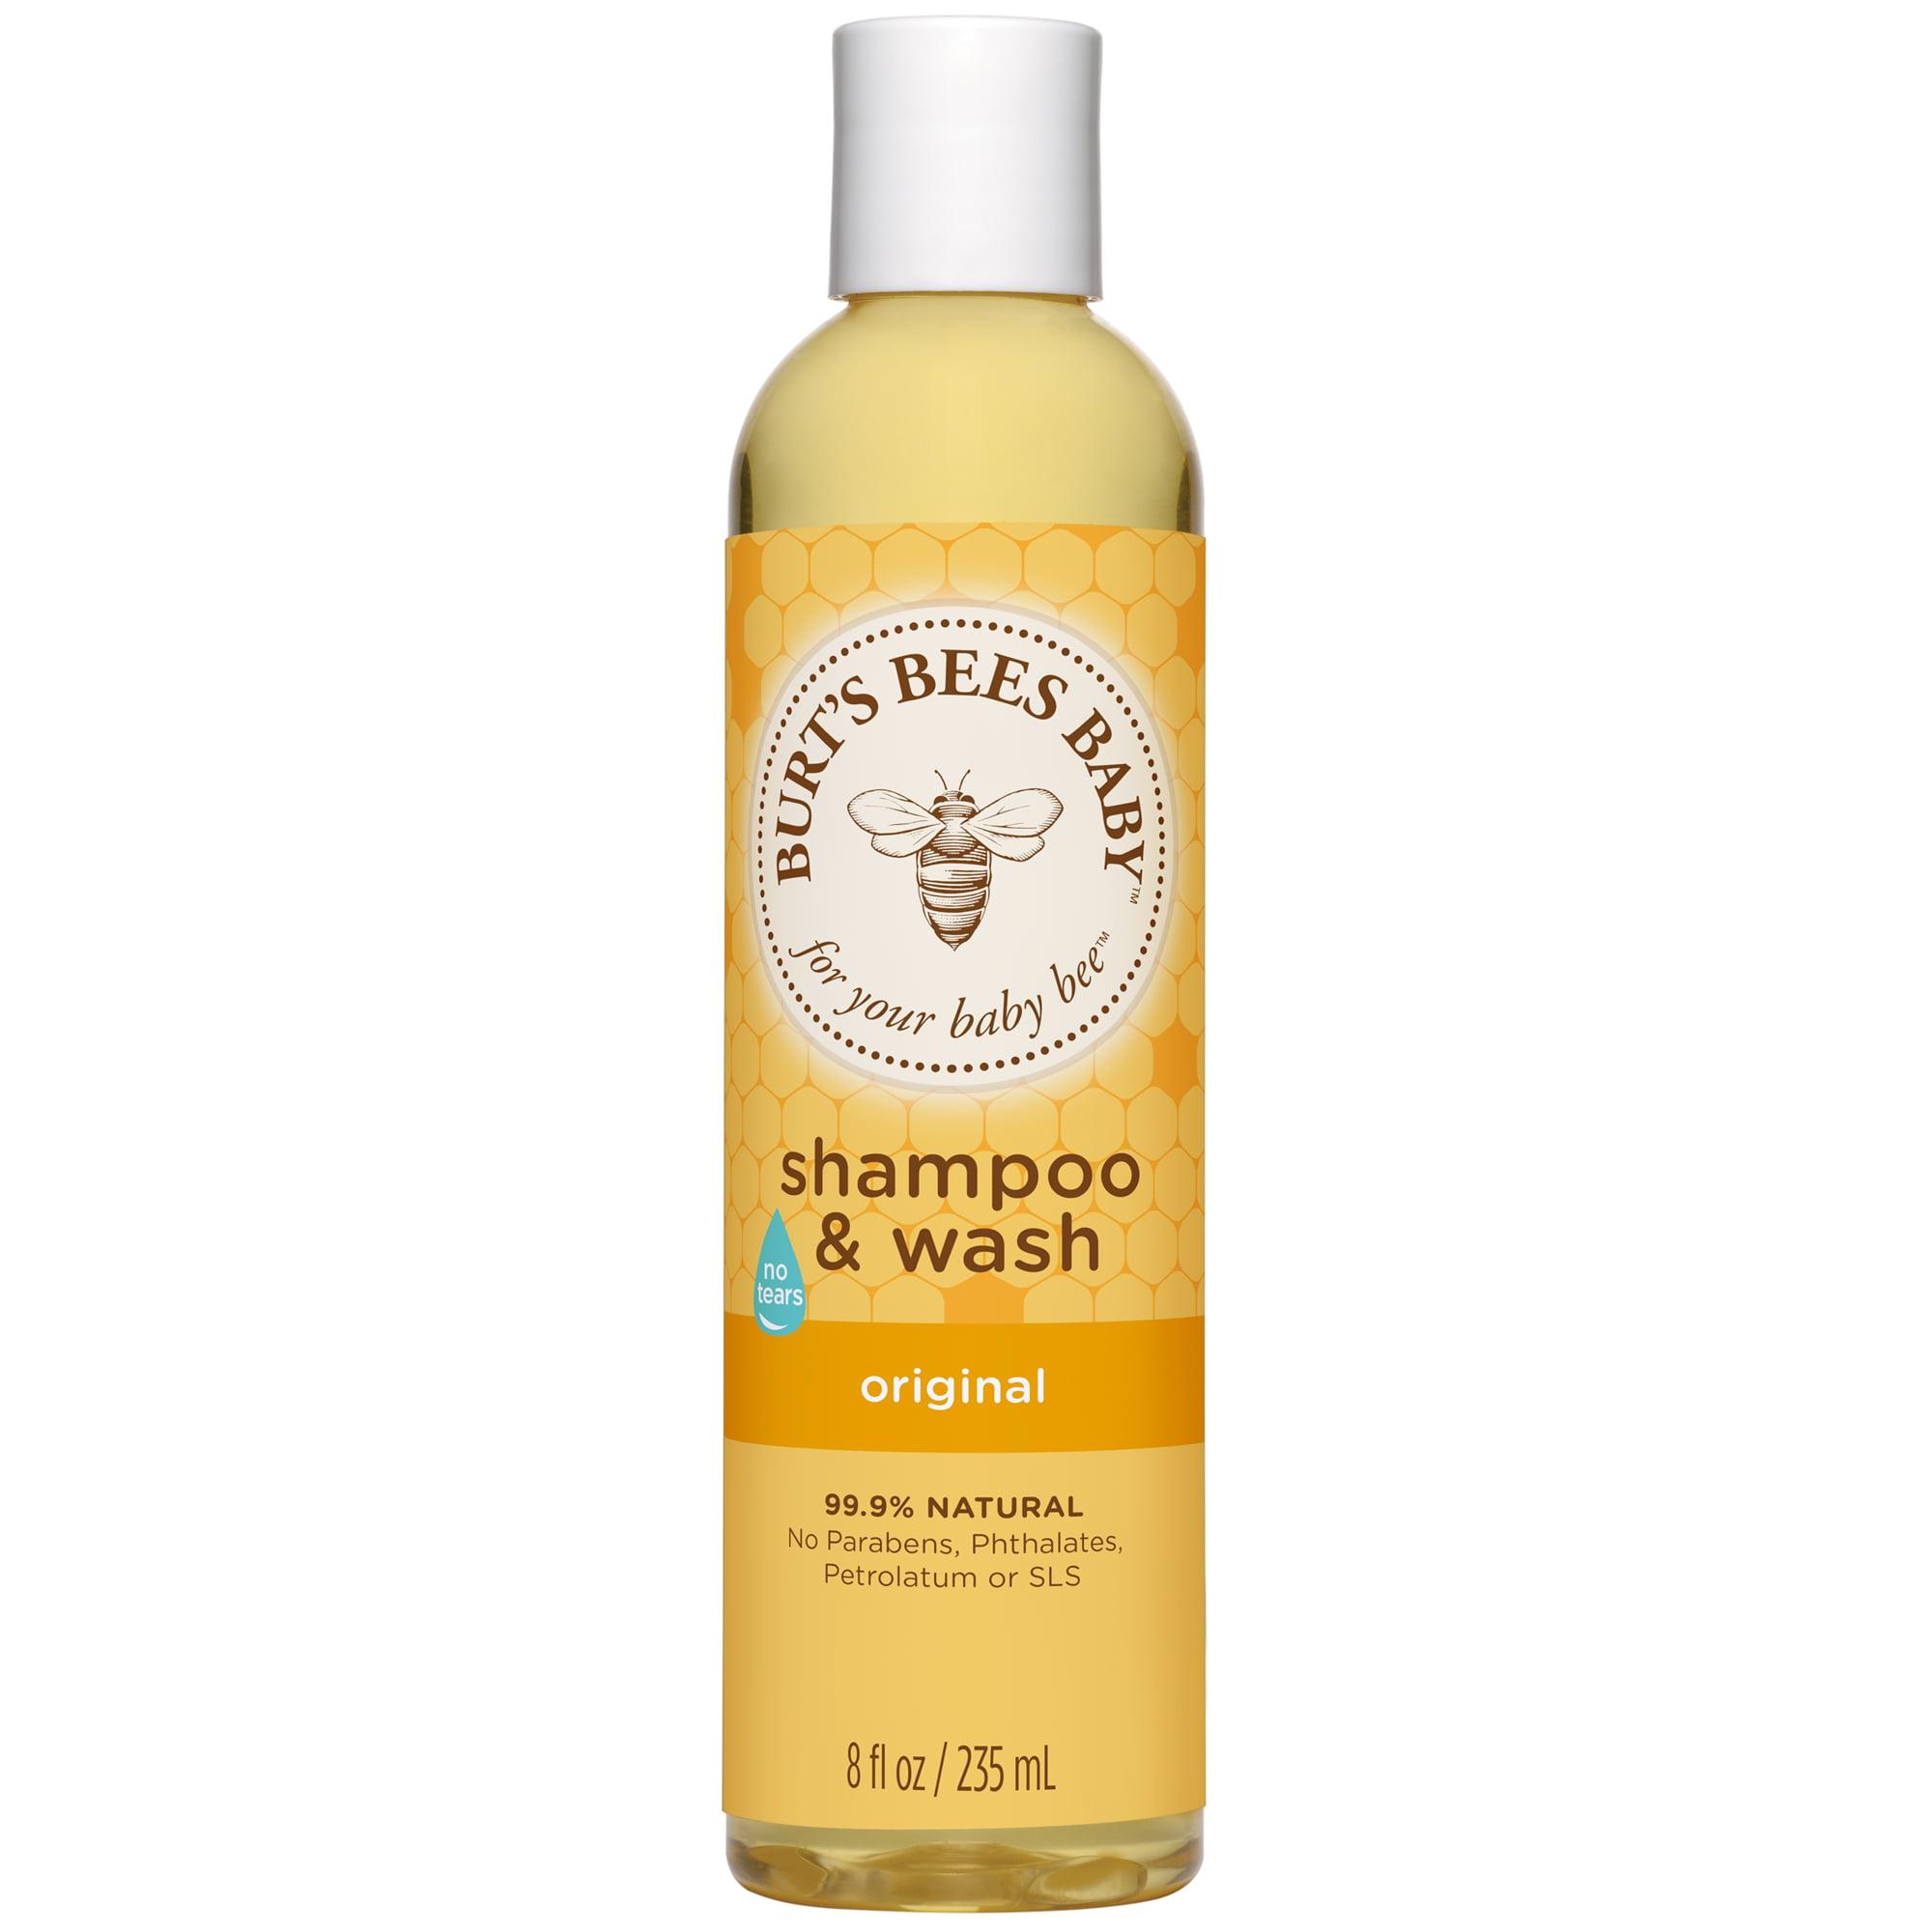 Burt's Bees Baby Shampoo & Wash, Original Tear Free Baby Soap 8 oz Bottle by Burt%27s Bees Baby